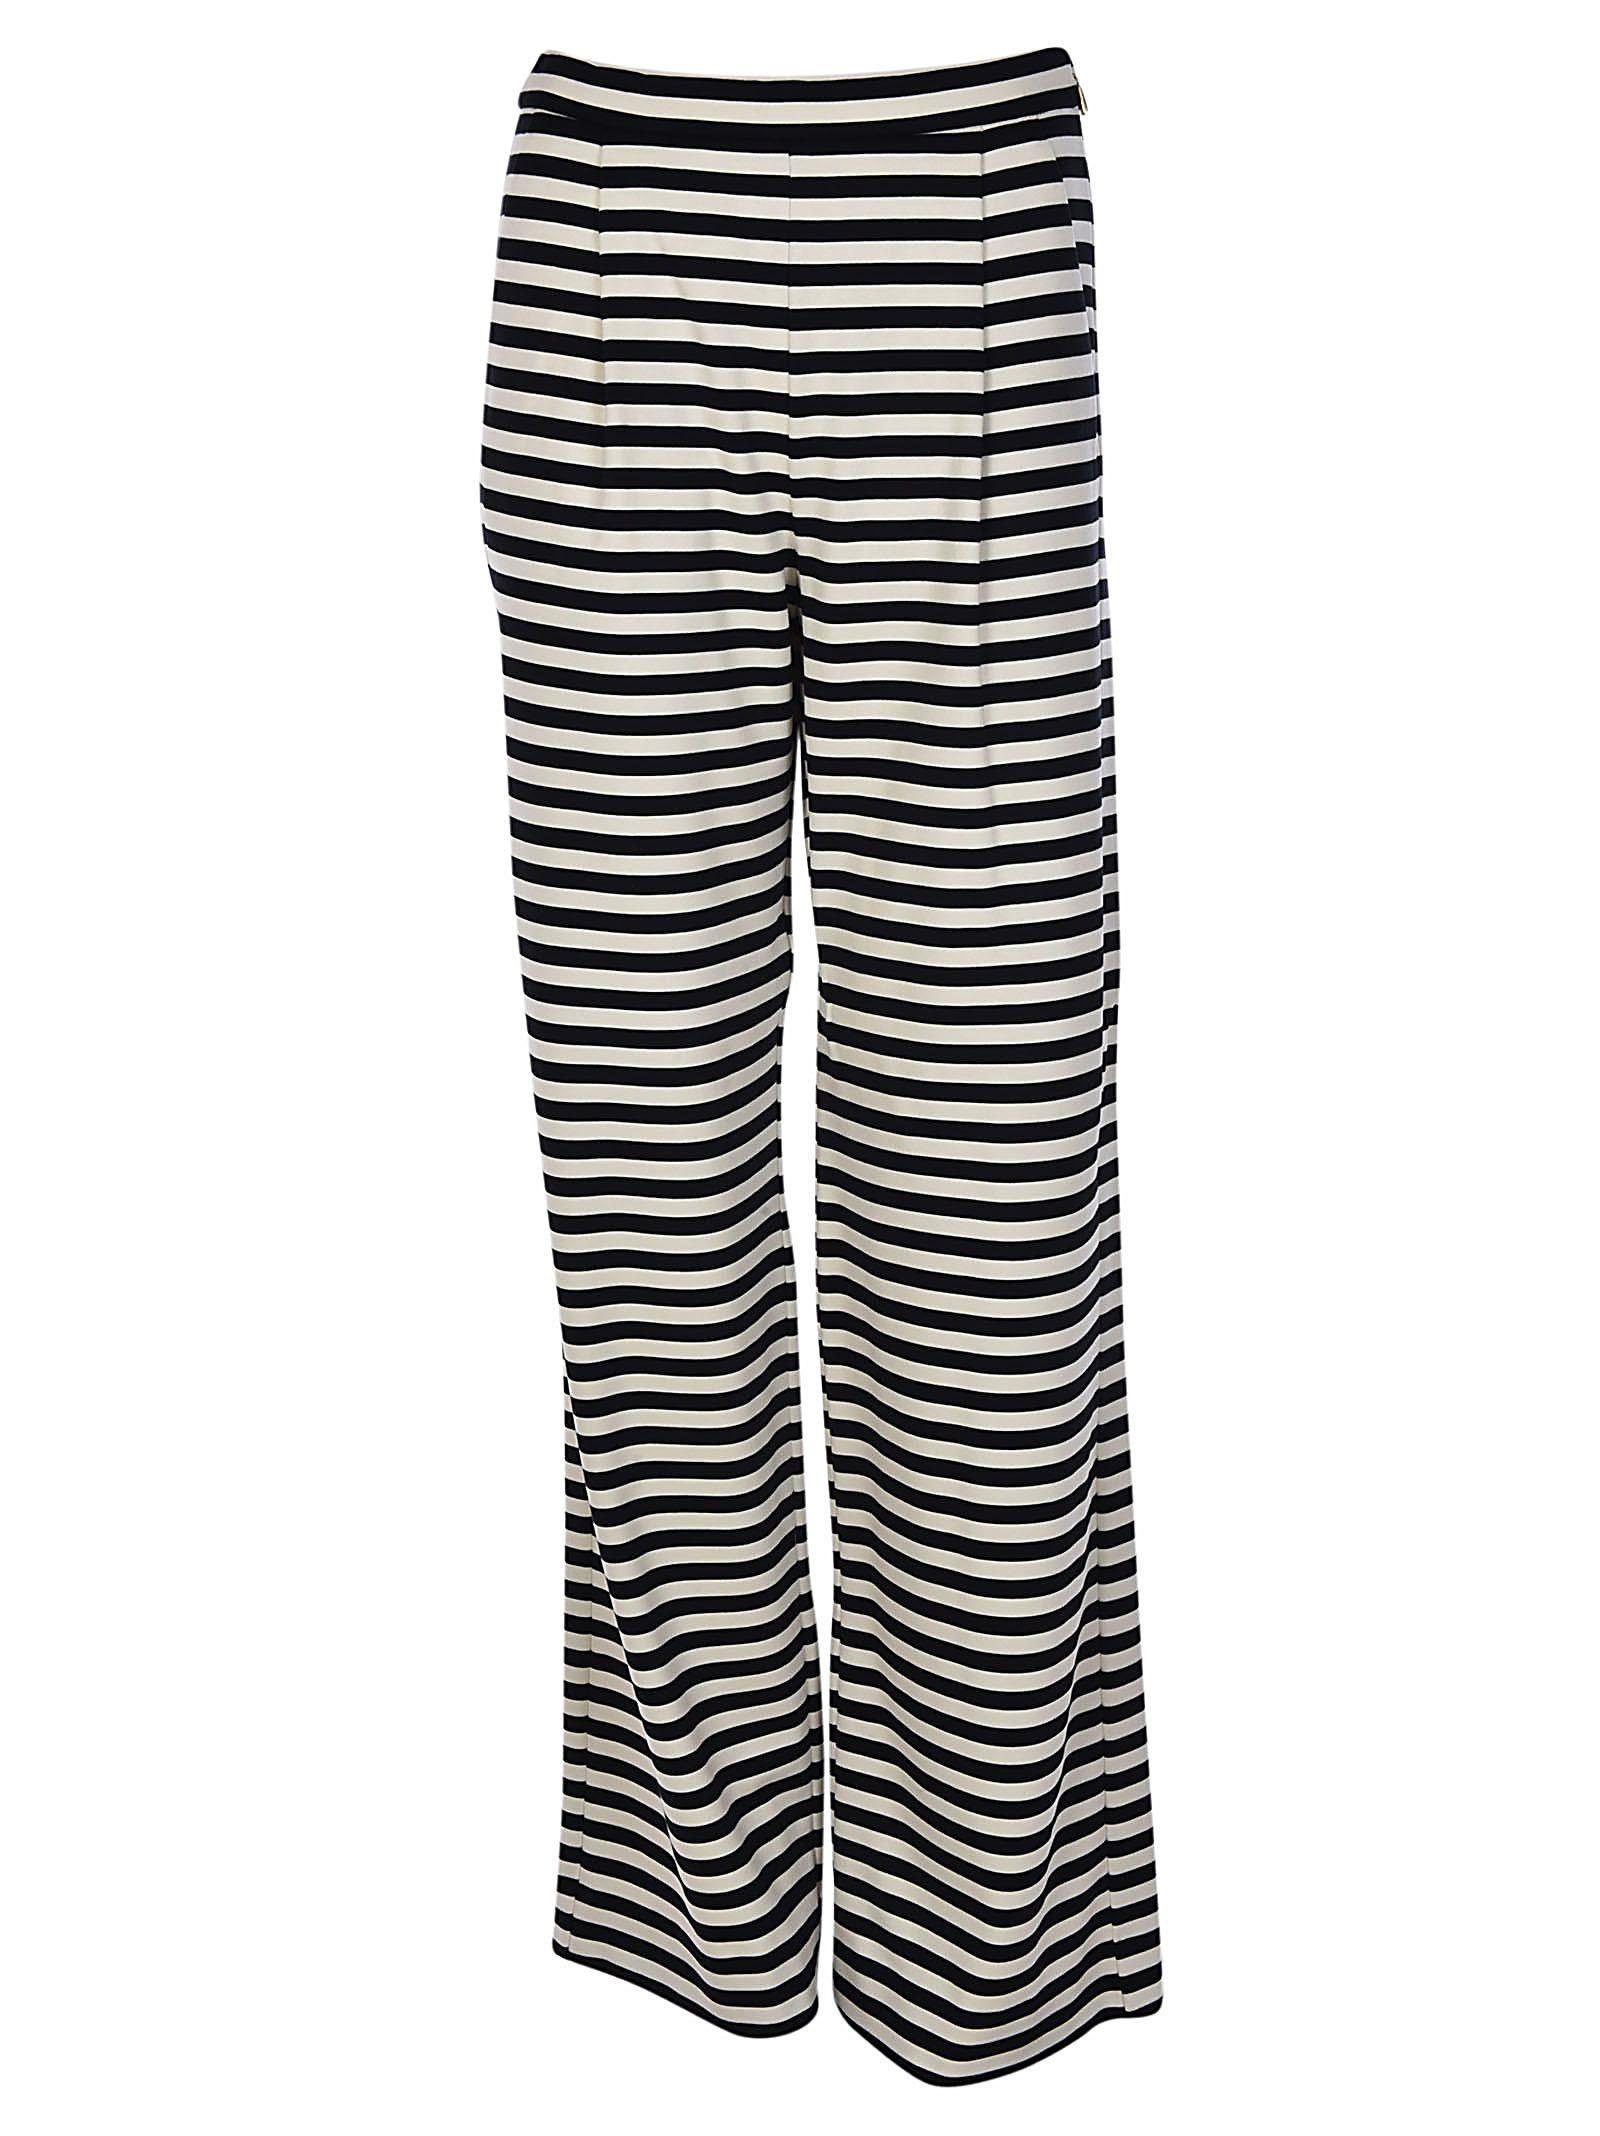 Max Mara Striped Wide Leg Trousers